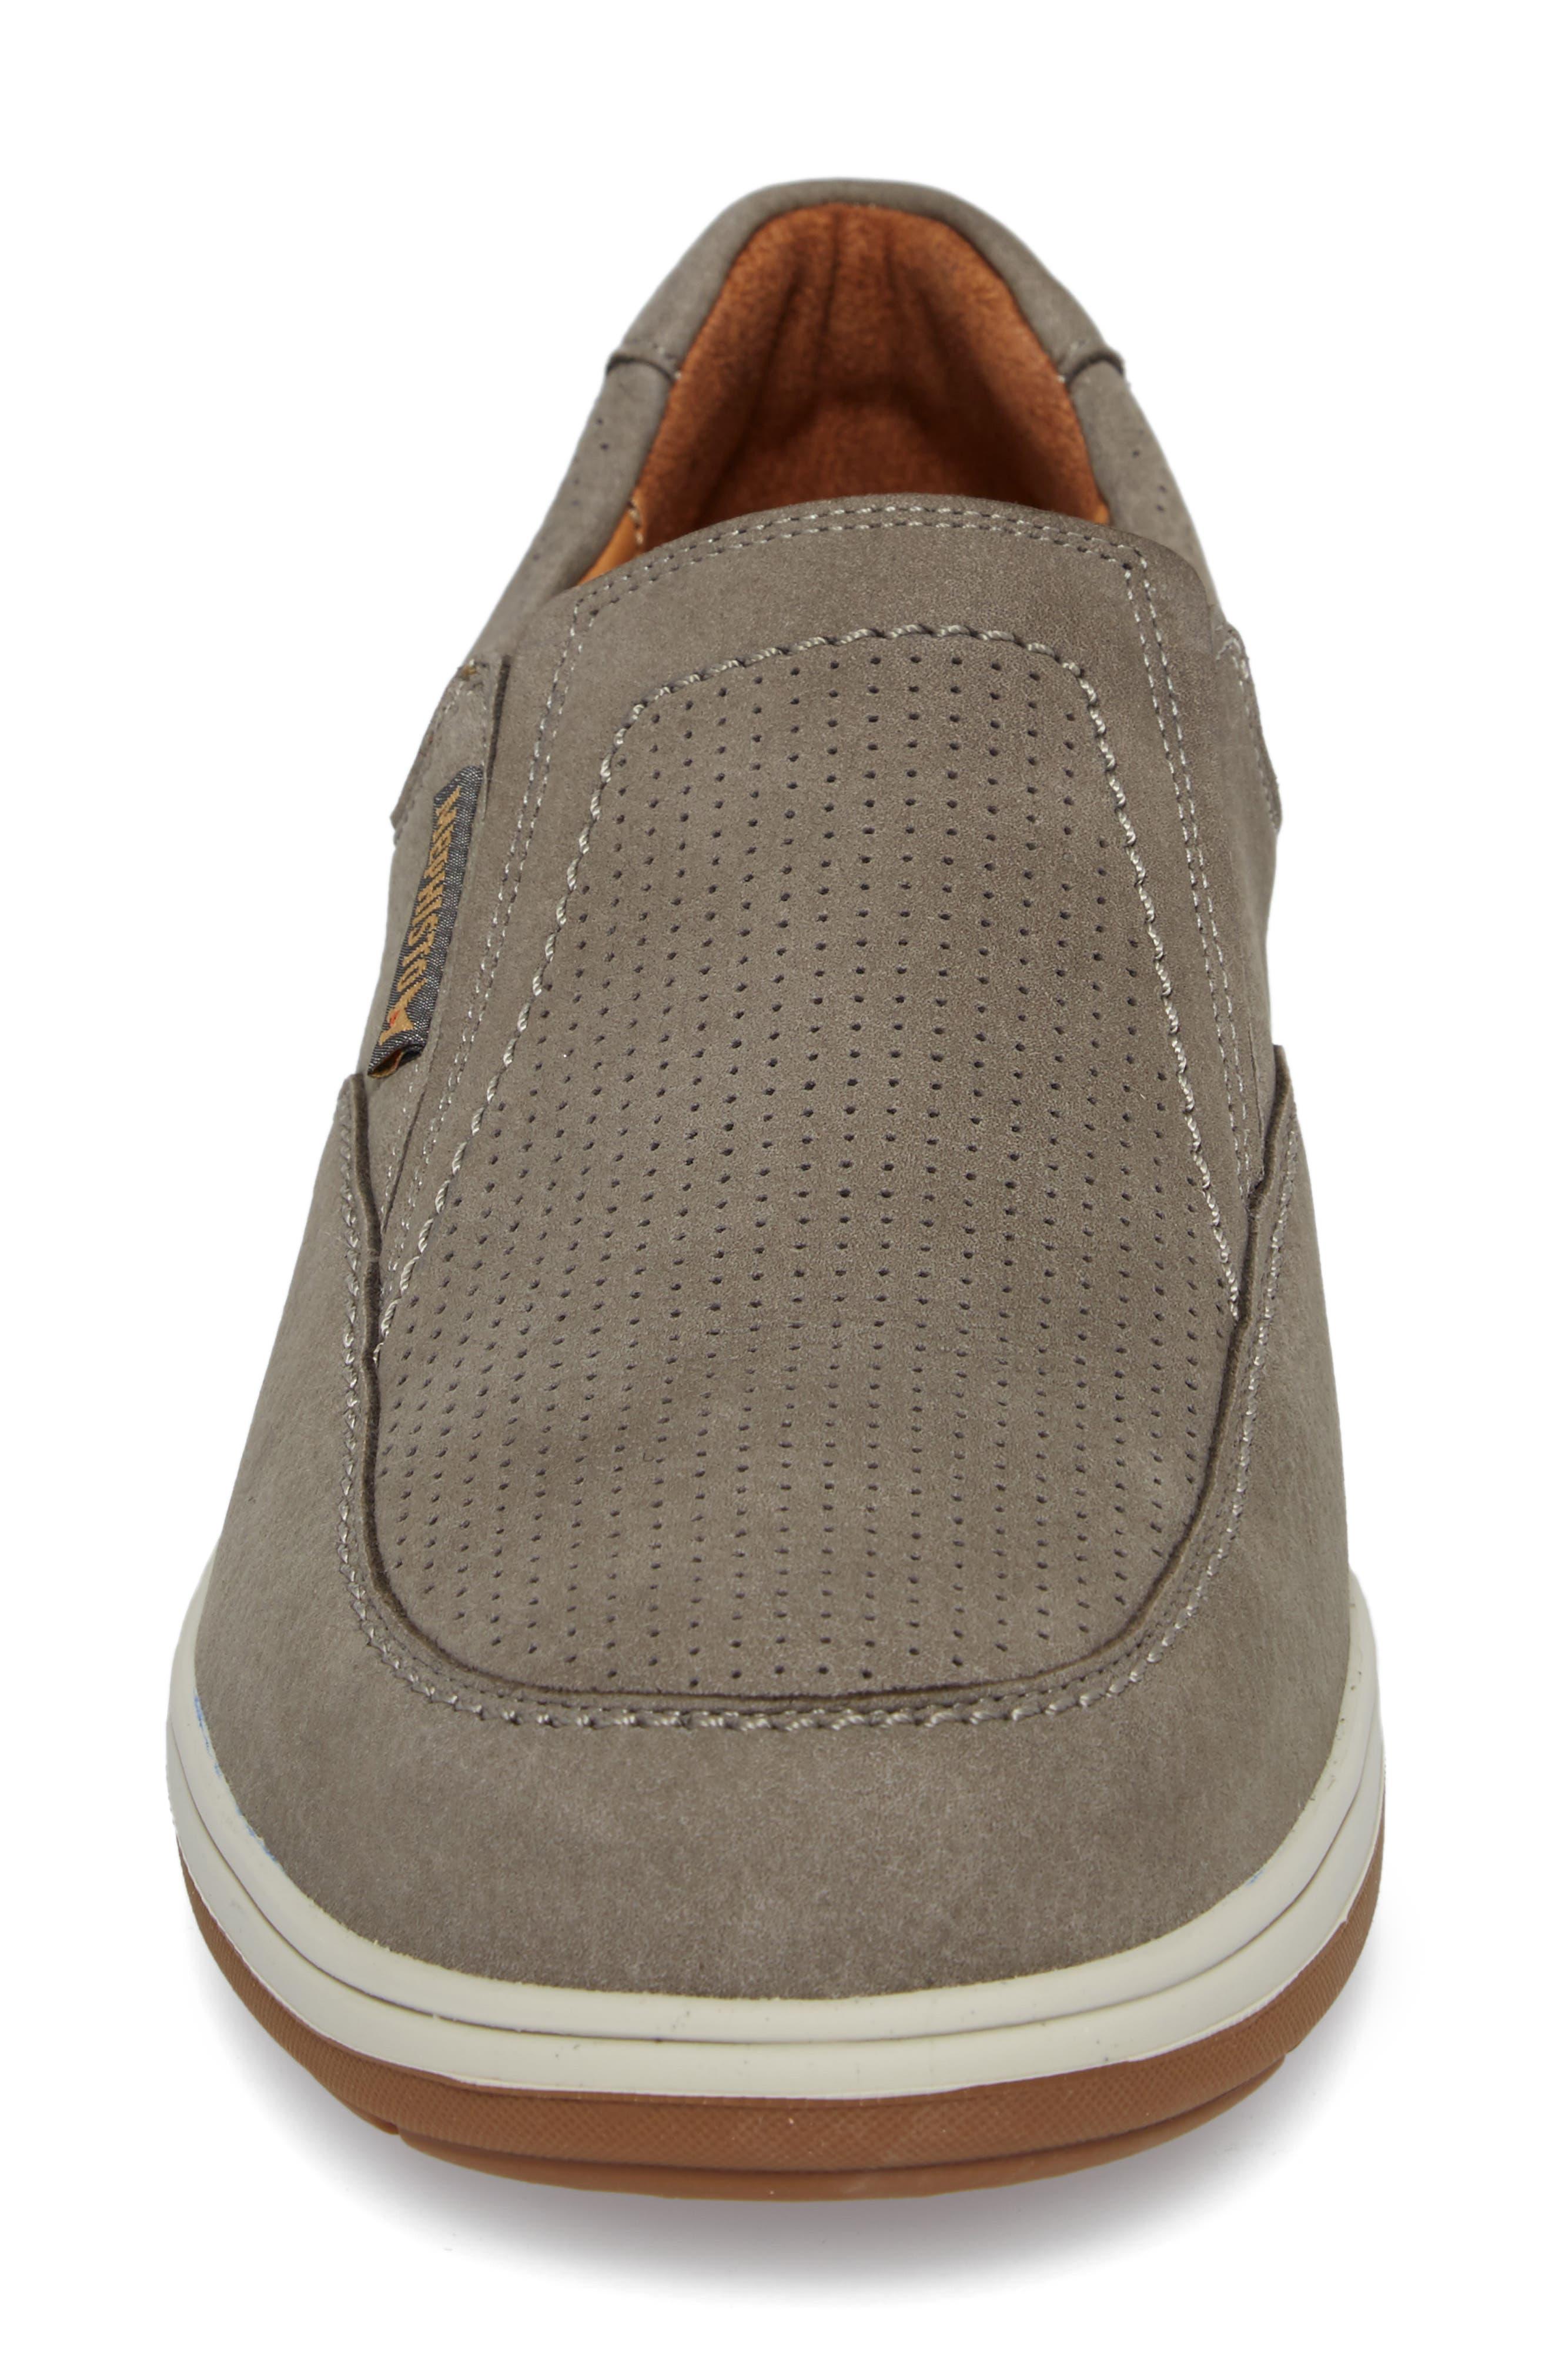 Davy Perforated Slip-On Sneaker,                             Alternate thumbnail 4, color,                             051